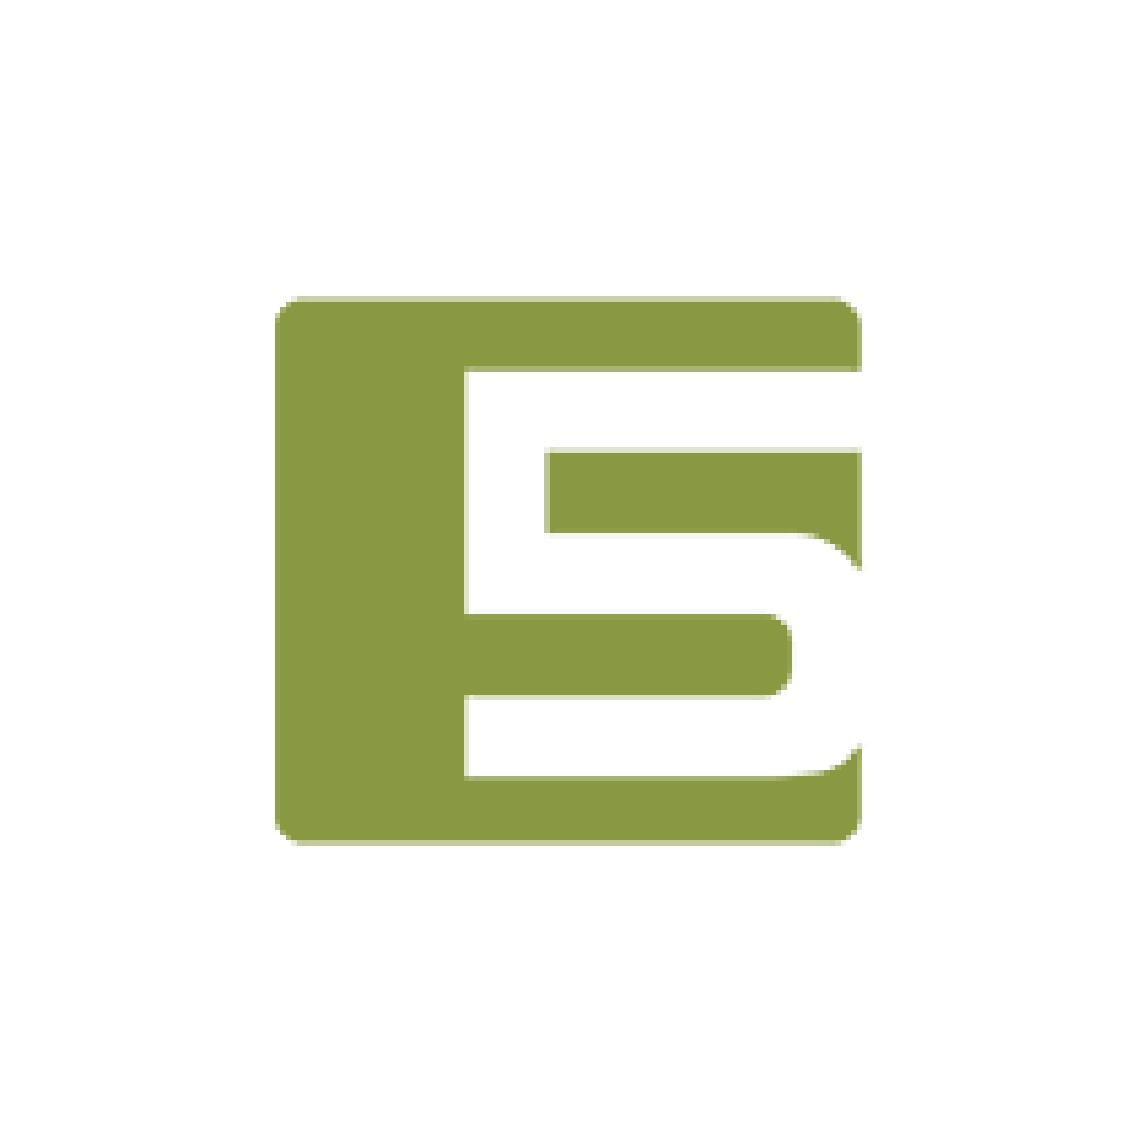 Element 5 Architecture